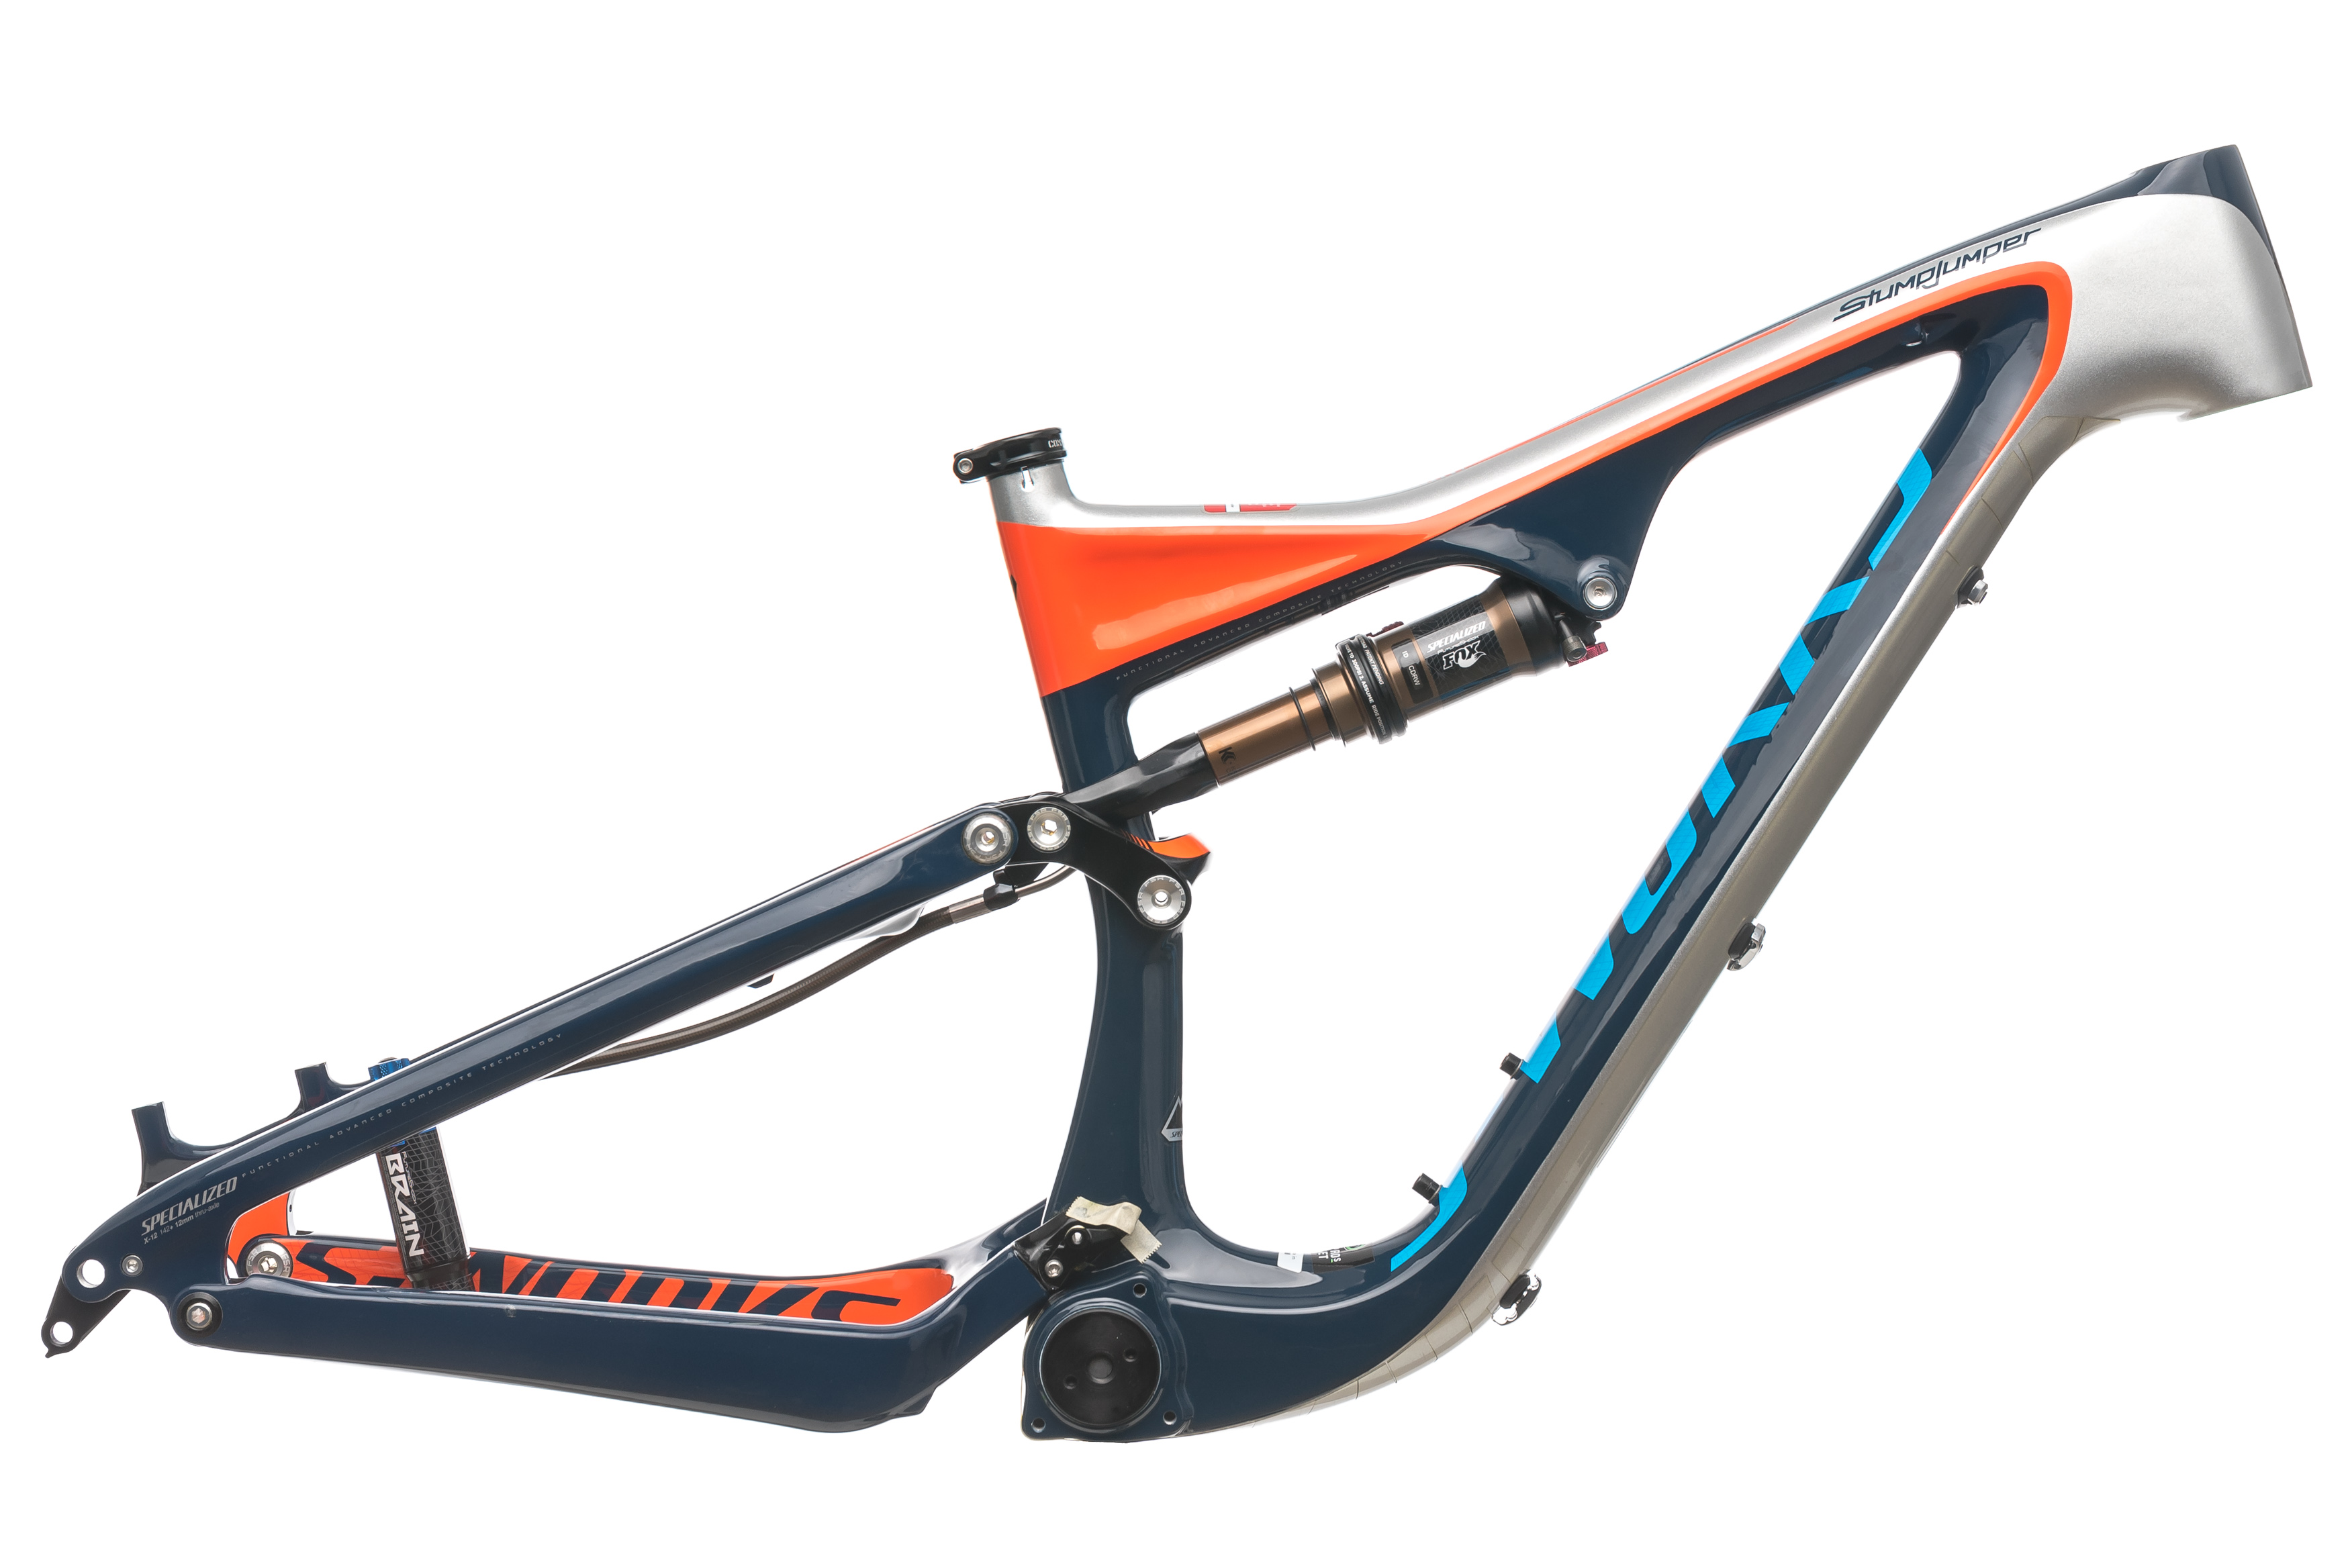 f9f536e298c 2013 Specialized S-Works Stumpjumper FSR Carbon Mountain Bike Frame Small